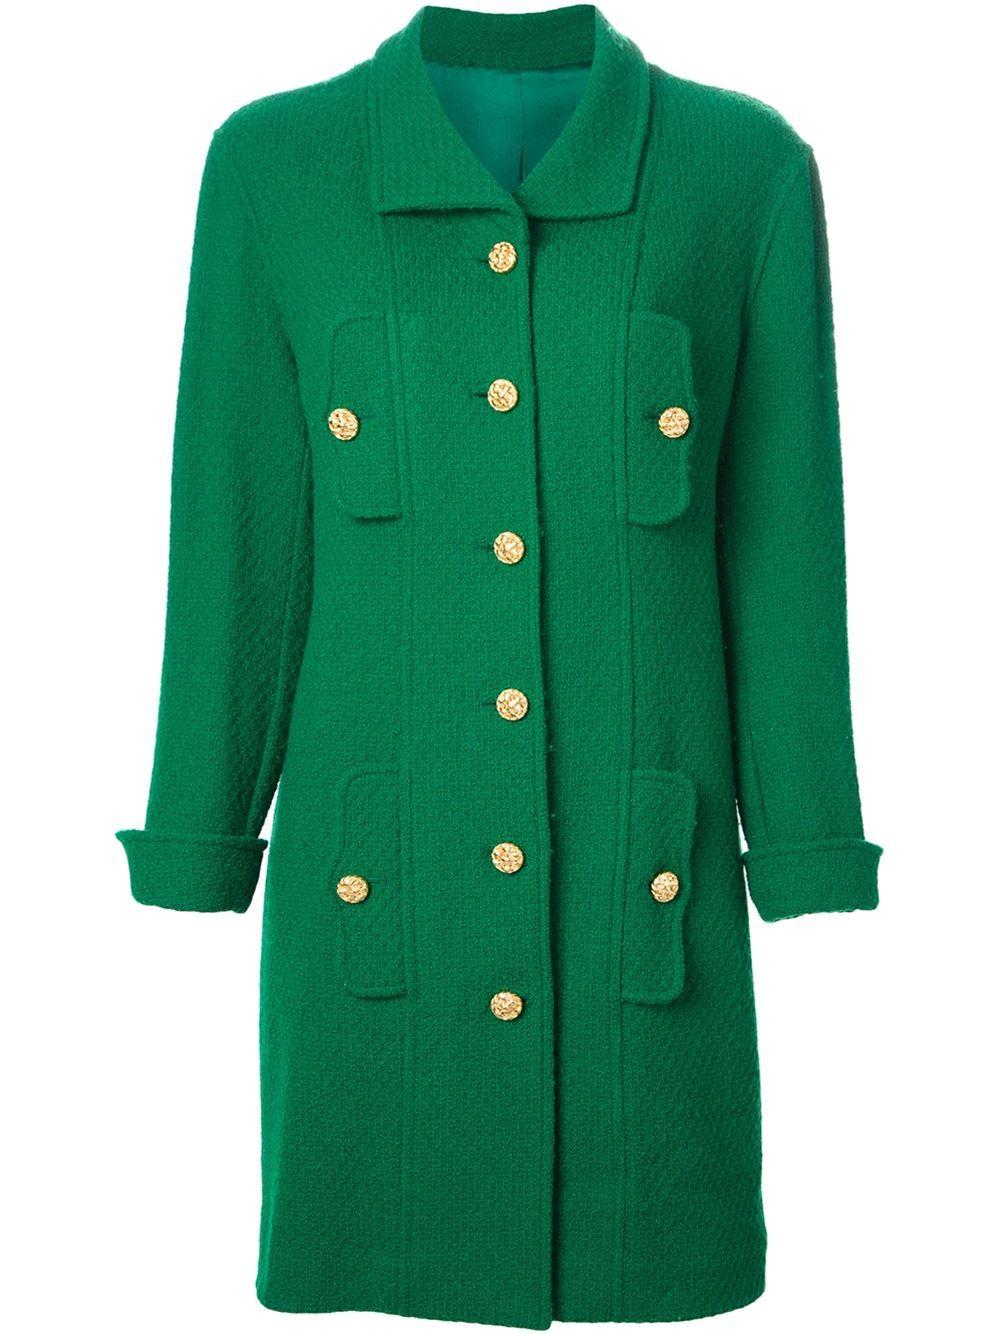 Chanel Vintage Single Breasted Coat - A.n.g.e.l.o Vintage - Farfetch.com